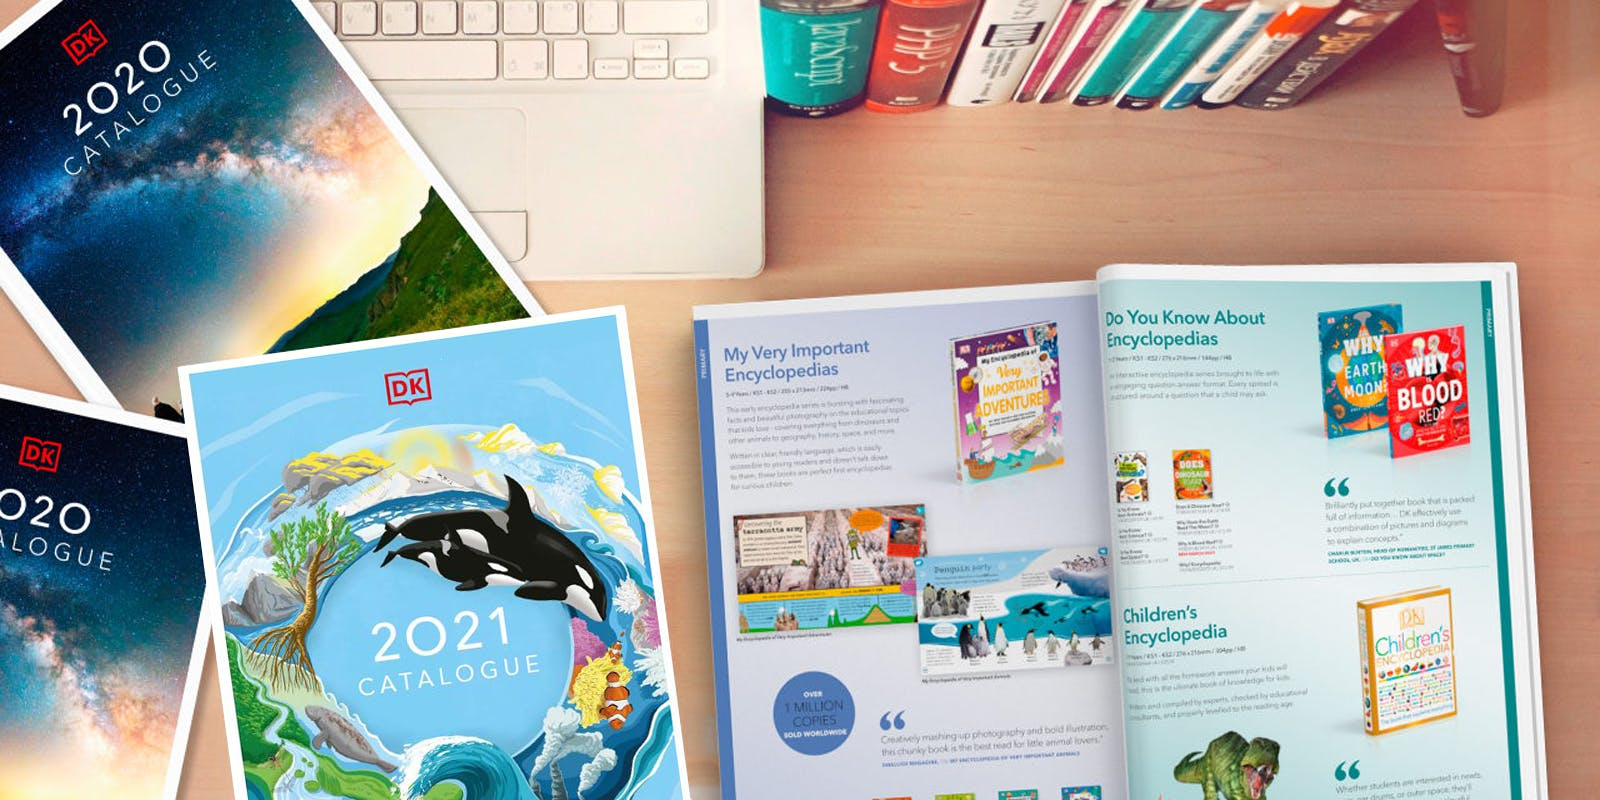 DK Catalogue 2021